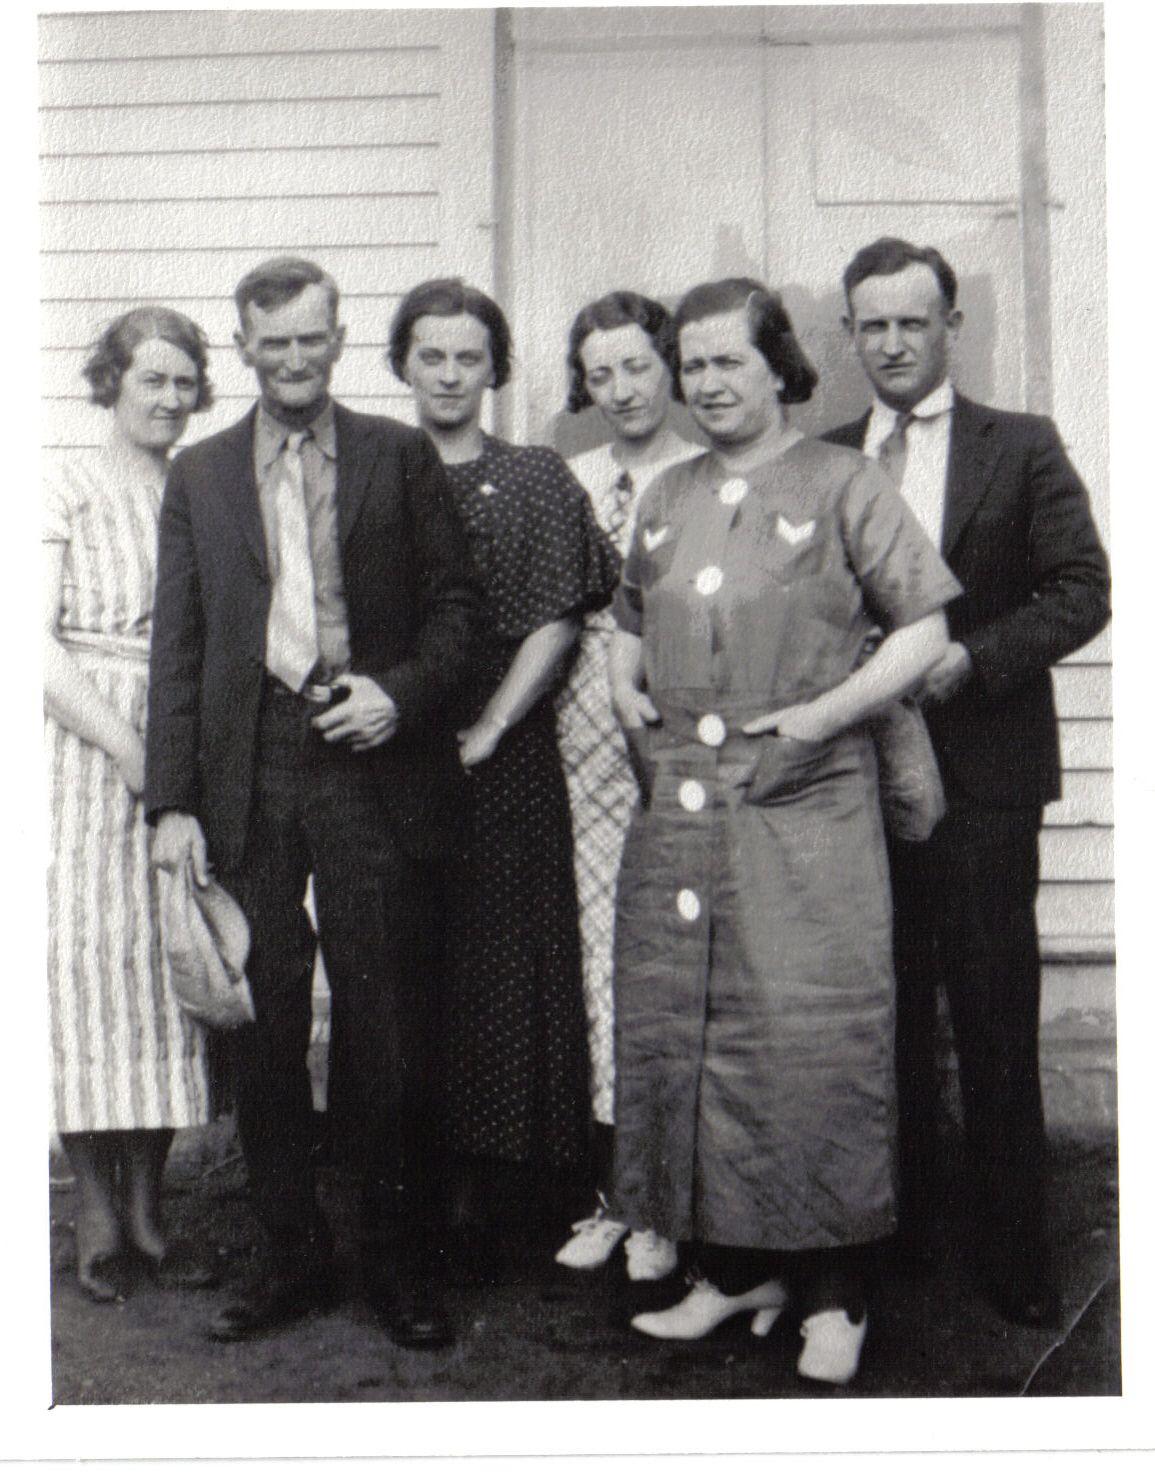 Abt 1935 Nell, Bill Sr, Katharine, Winnie, Anna, Bill